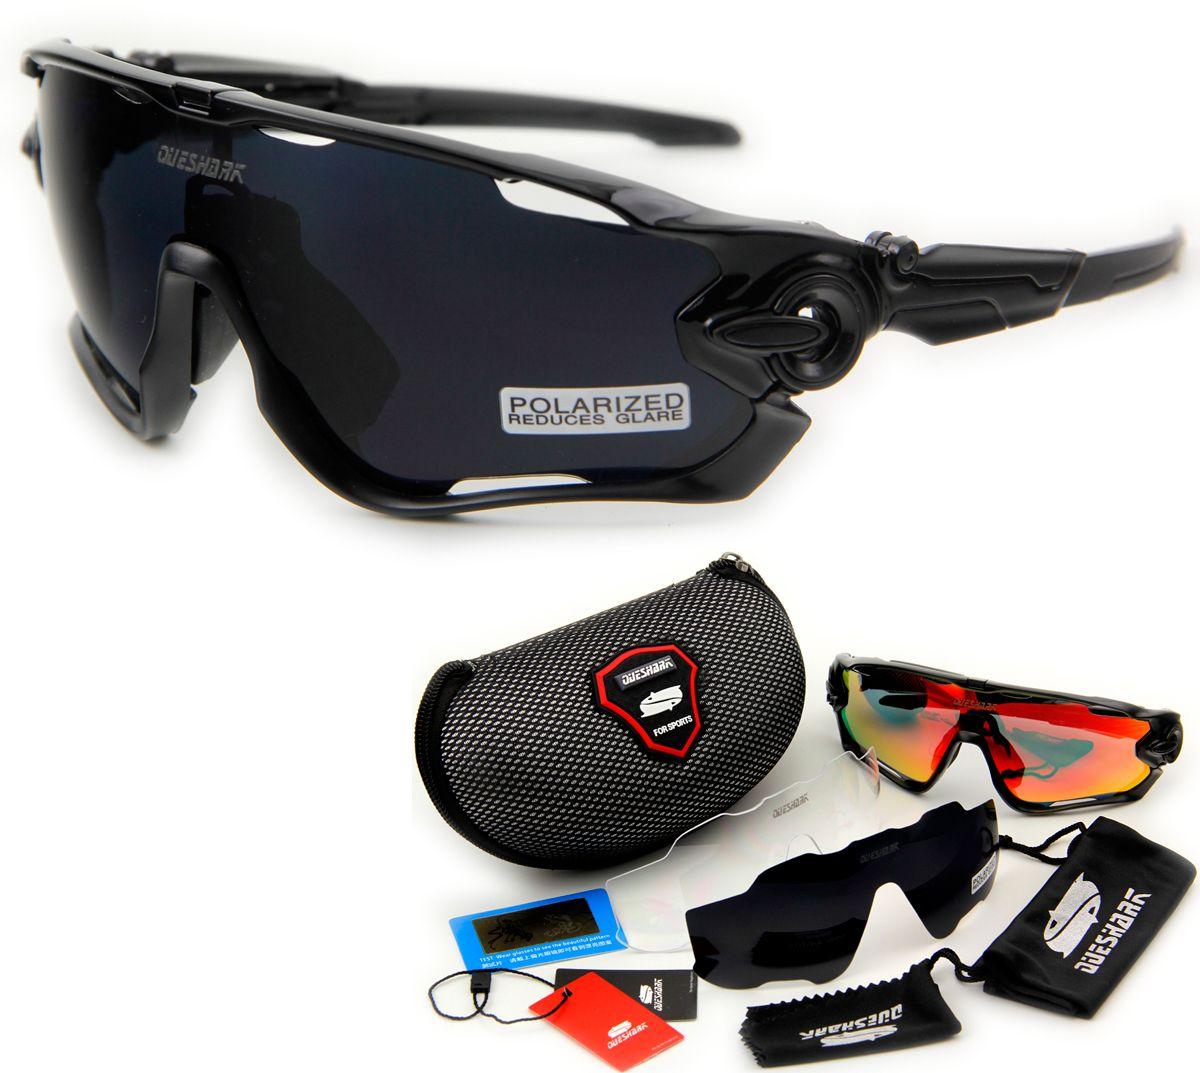 Queshark Brand Tour De France Polarized Cycling Sunglasses Cycling